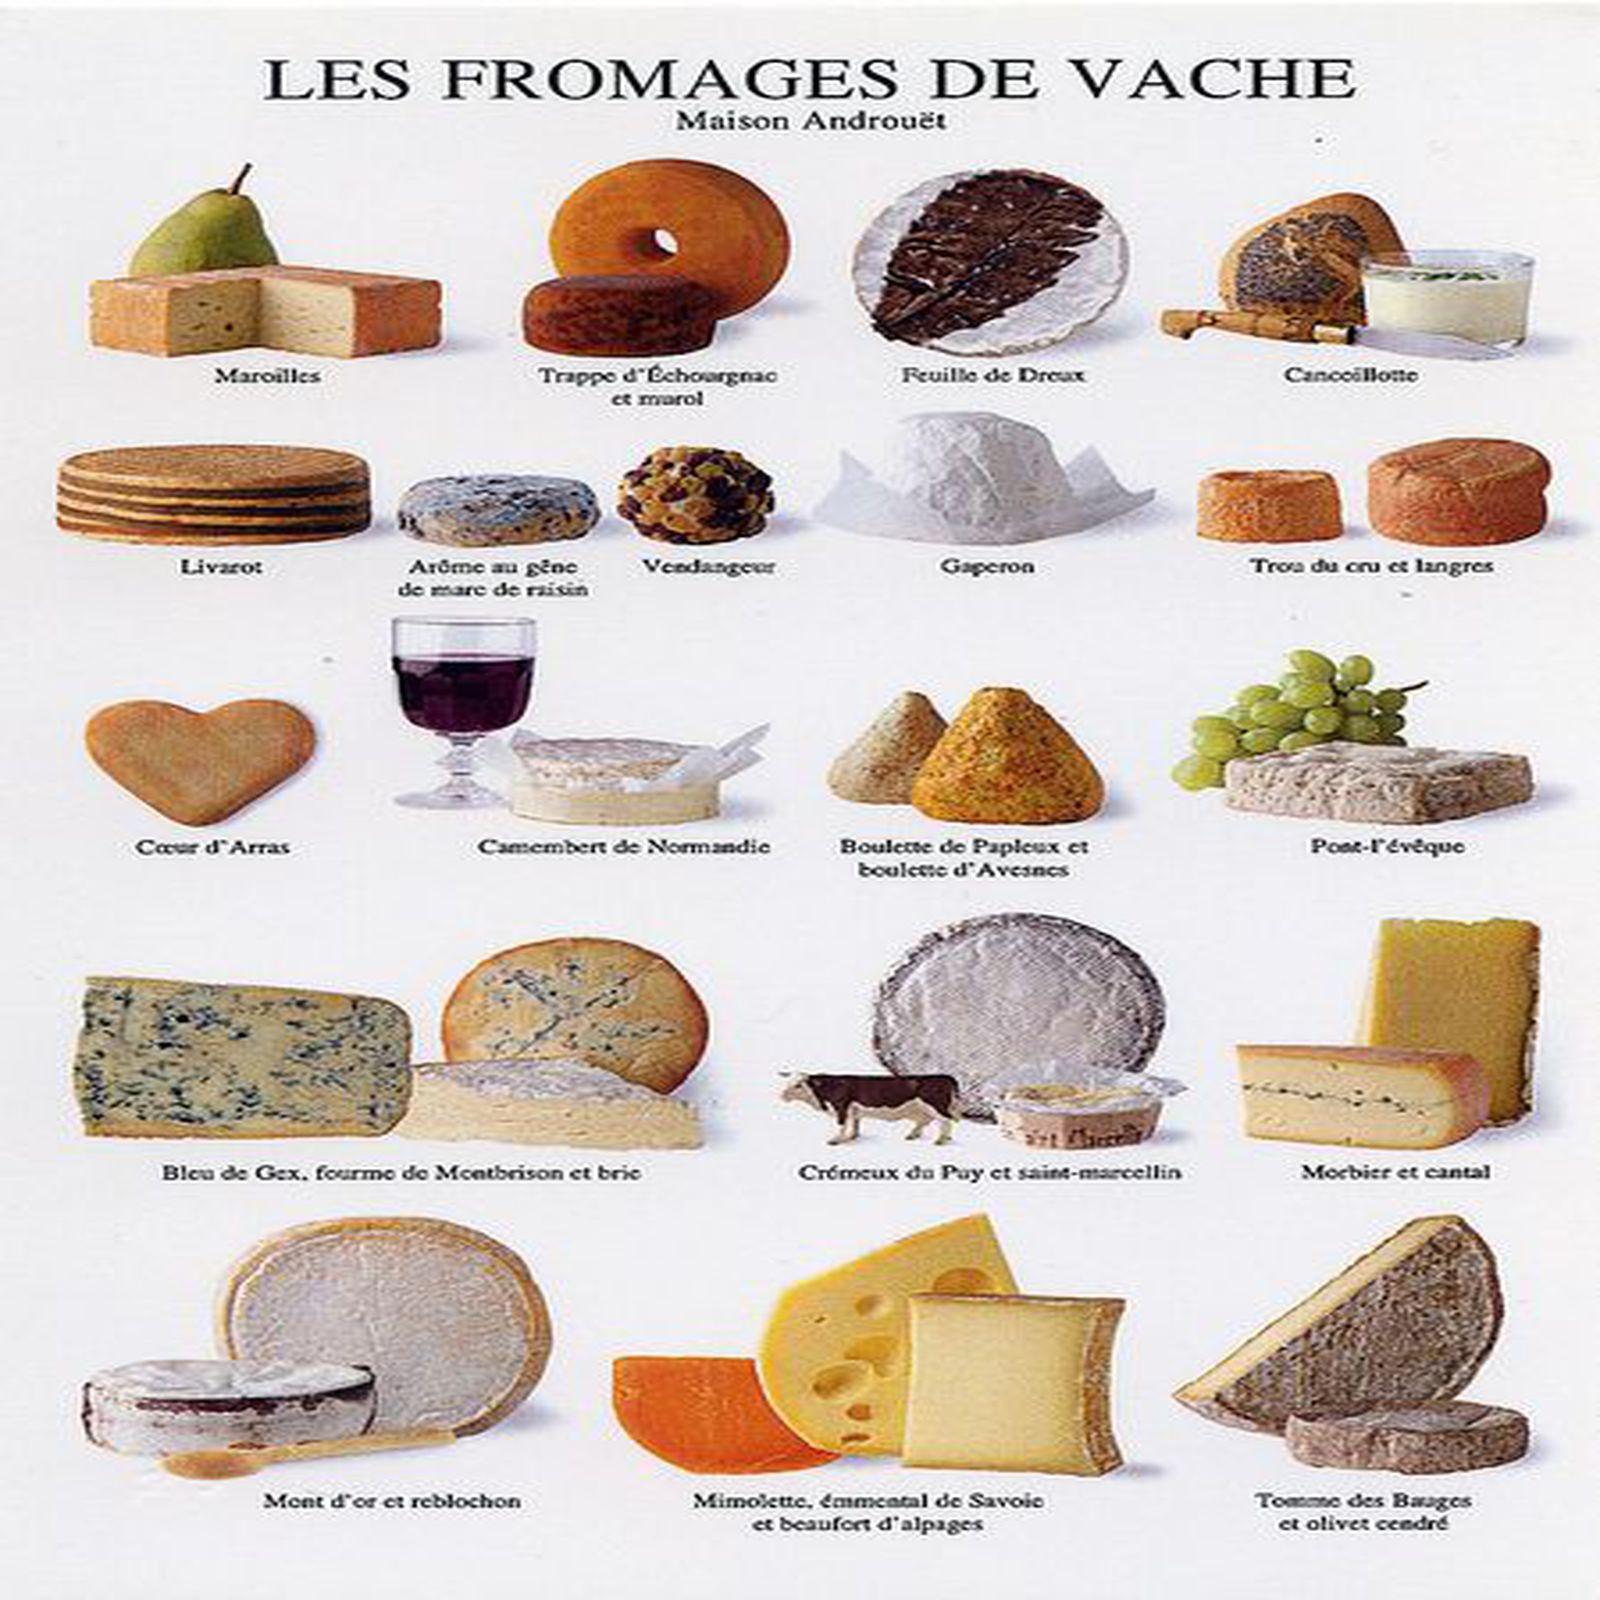 les diff u00e9rentes vari u00e9t u00e9s de fromages de vache